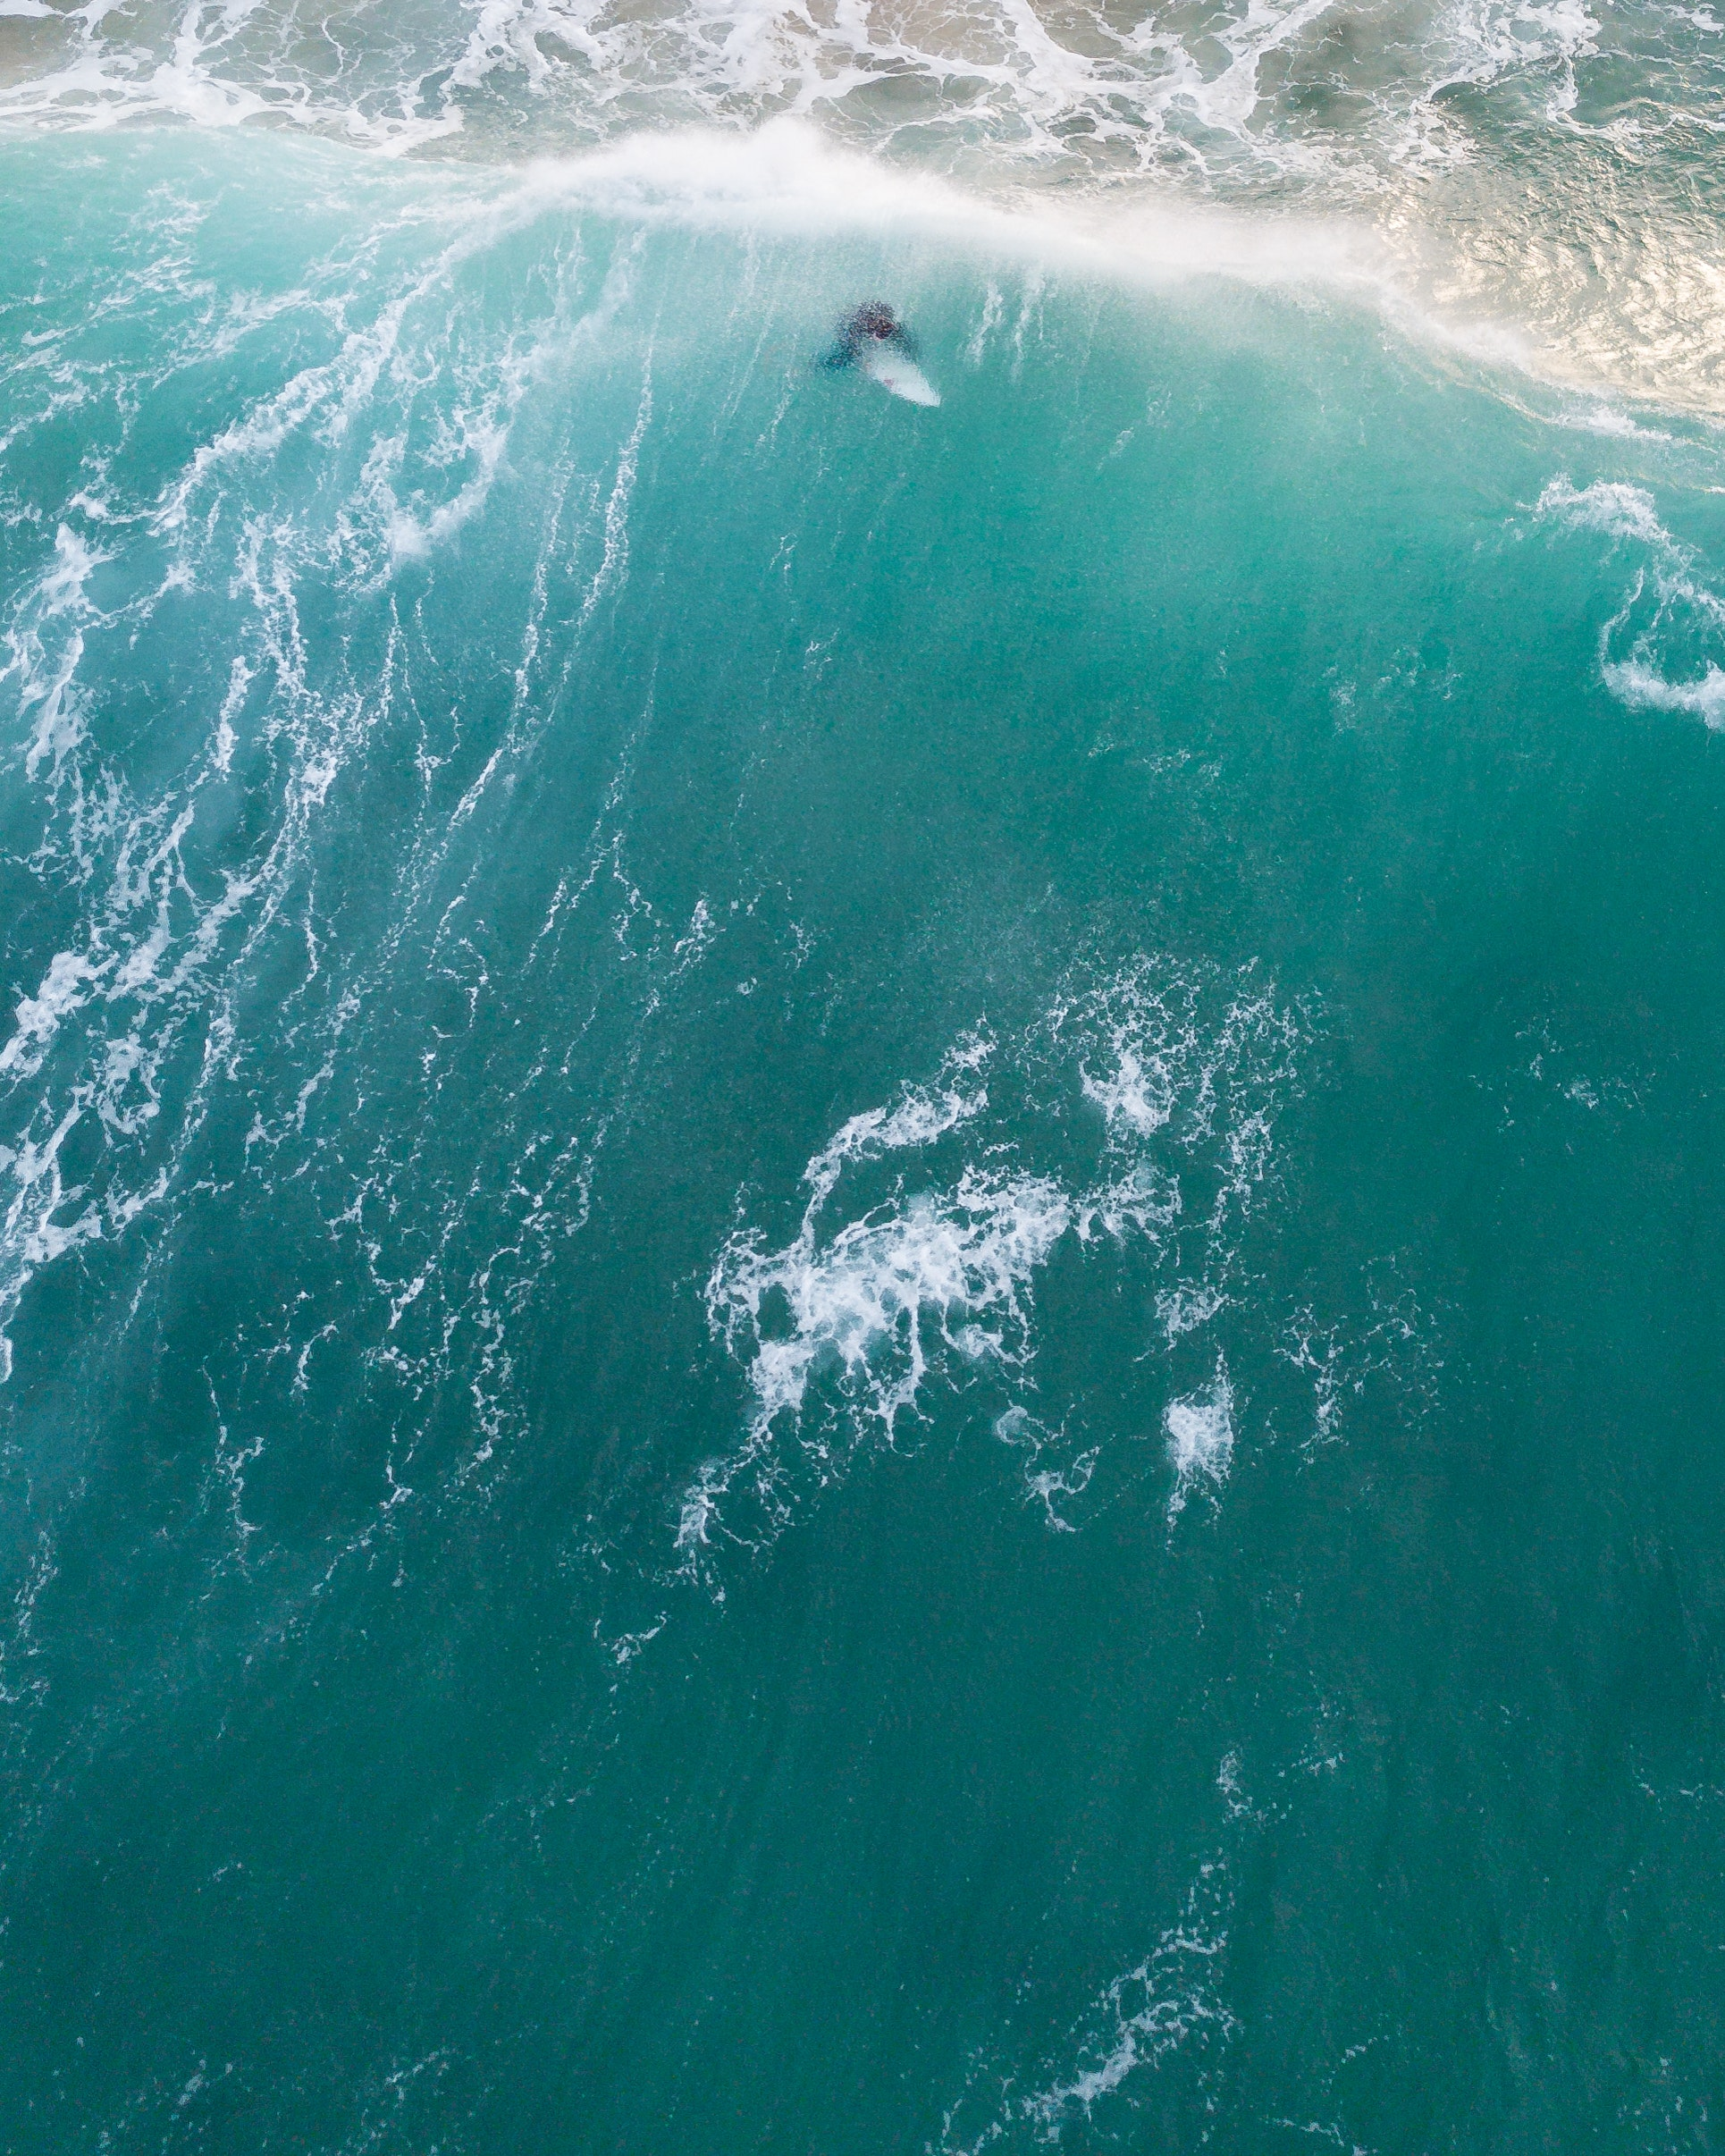 Bird S Eye View Of Ocean 183 Free Stock Photo